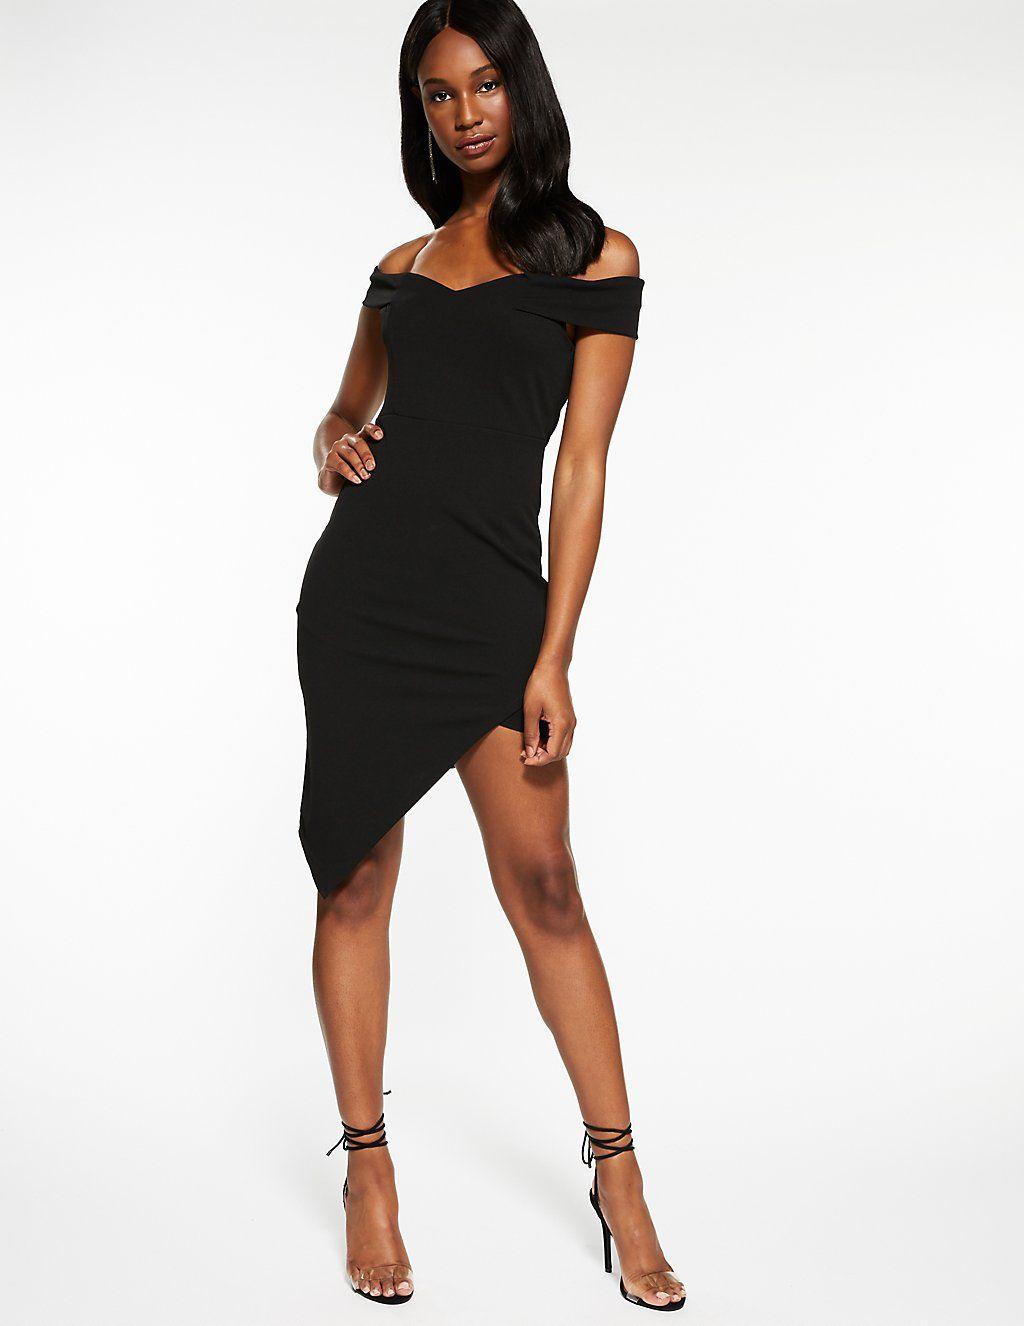 0fe1d63e0 Off The Shoulder Asymmetrical Dress | Birthday/ Christmas List 2018 ...